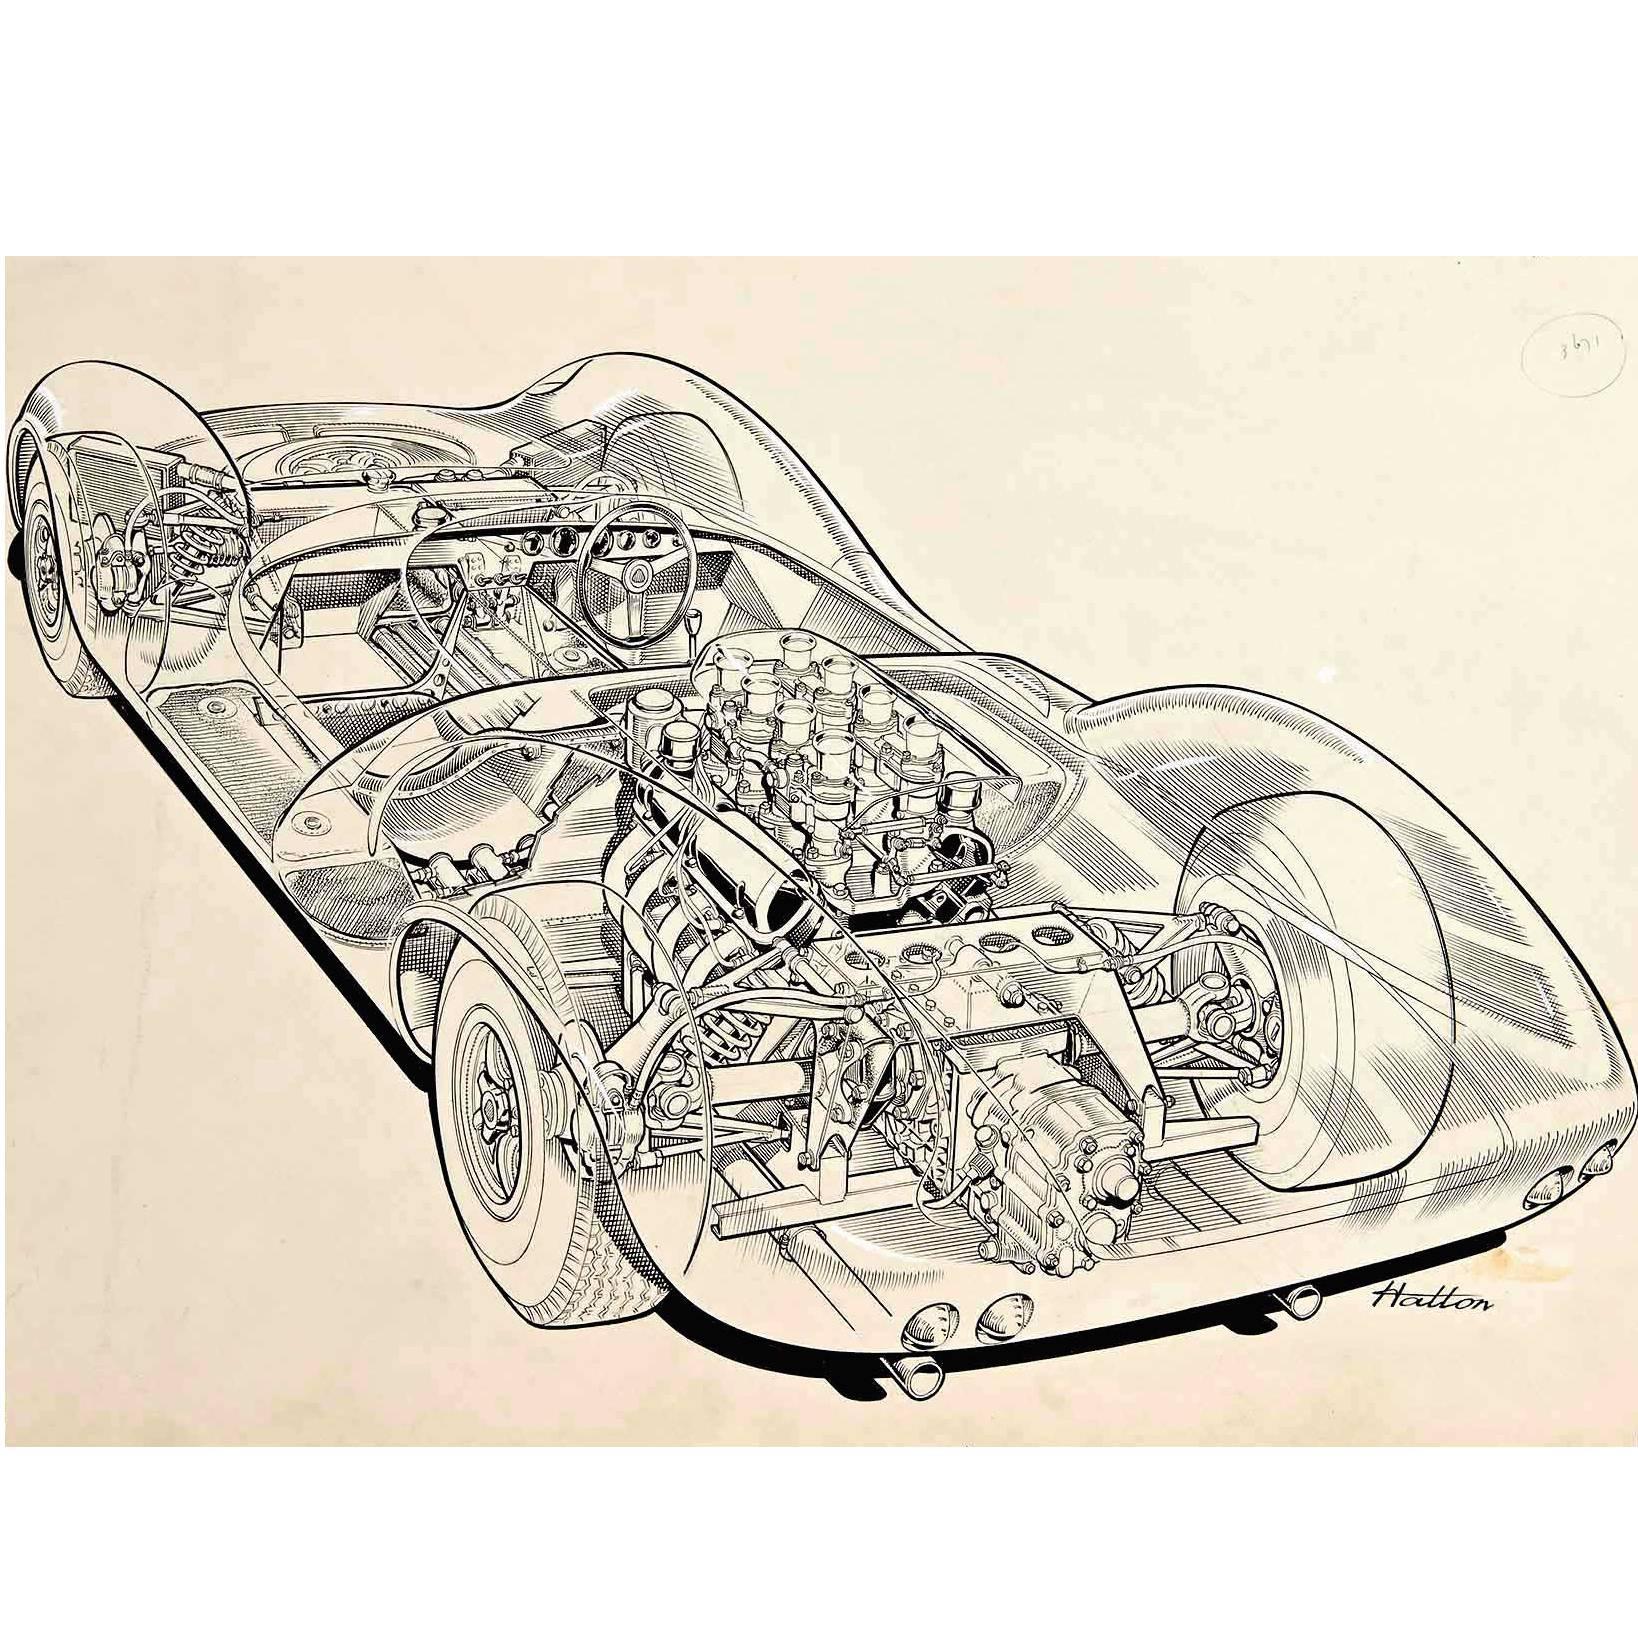 "Original ""Cutaway"" Drawing of the Lotus 30 Racing Car by Brian Hatton"